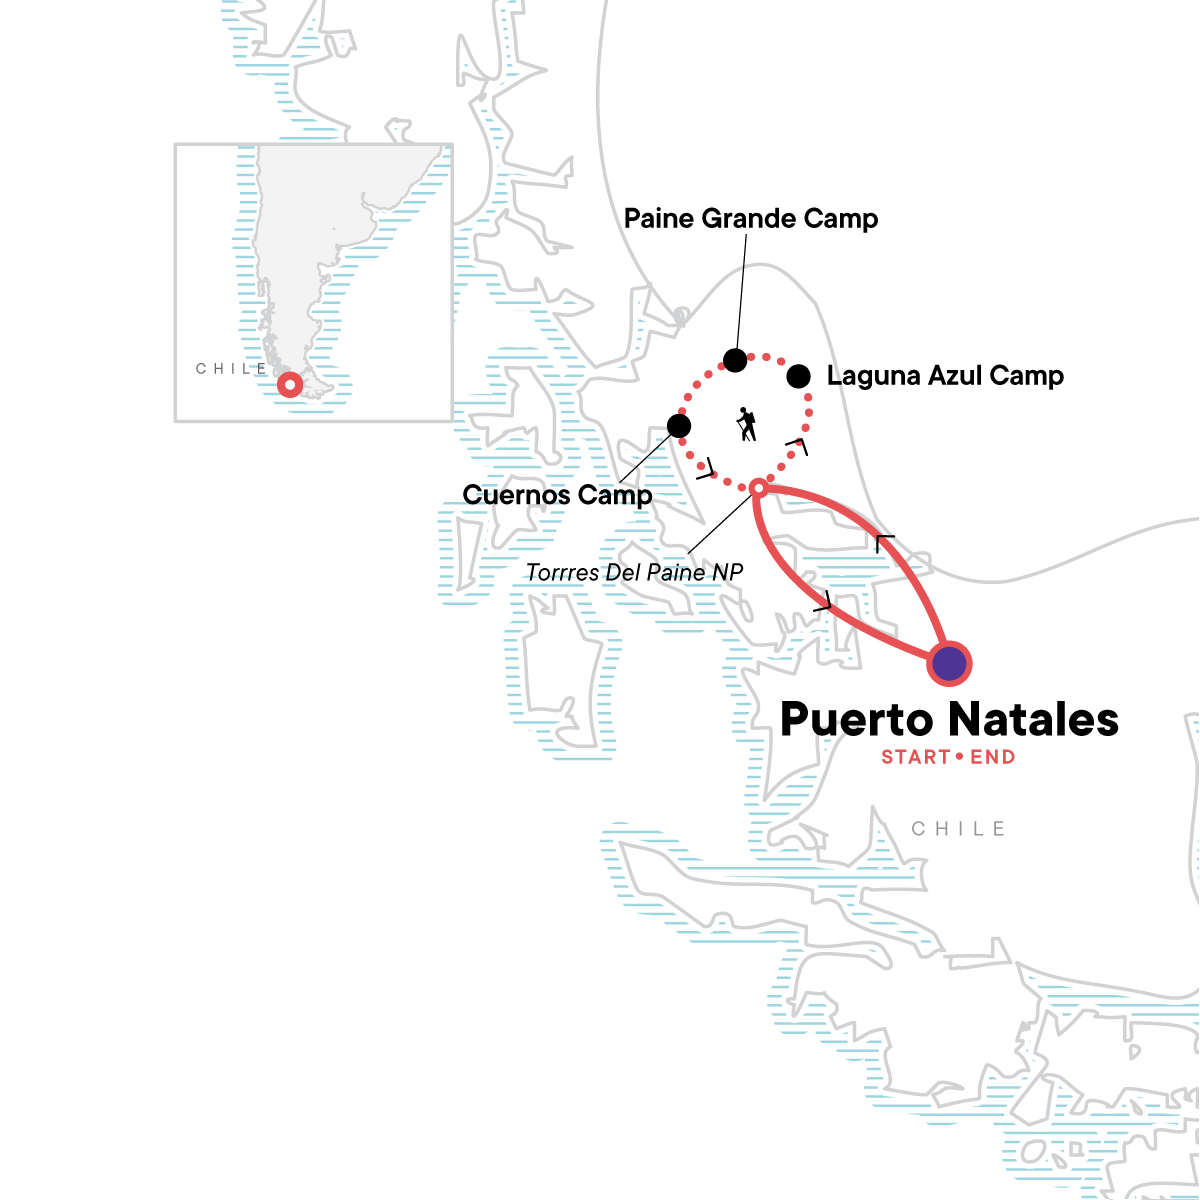 Torres del Paine - The W Trek Map